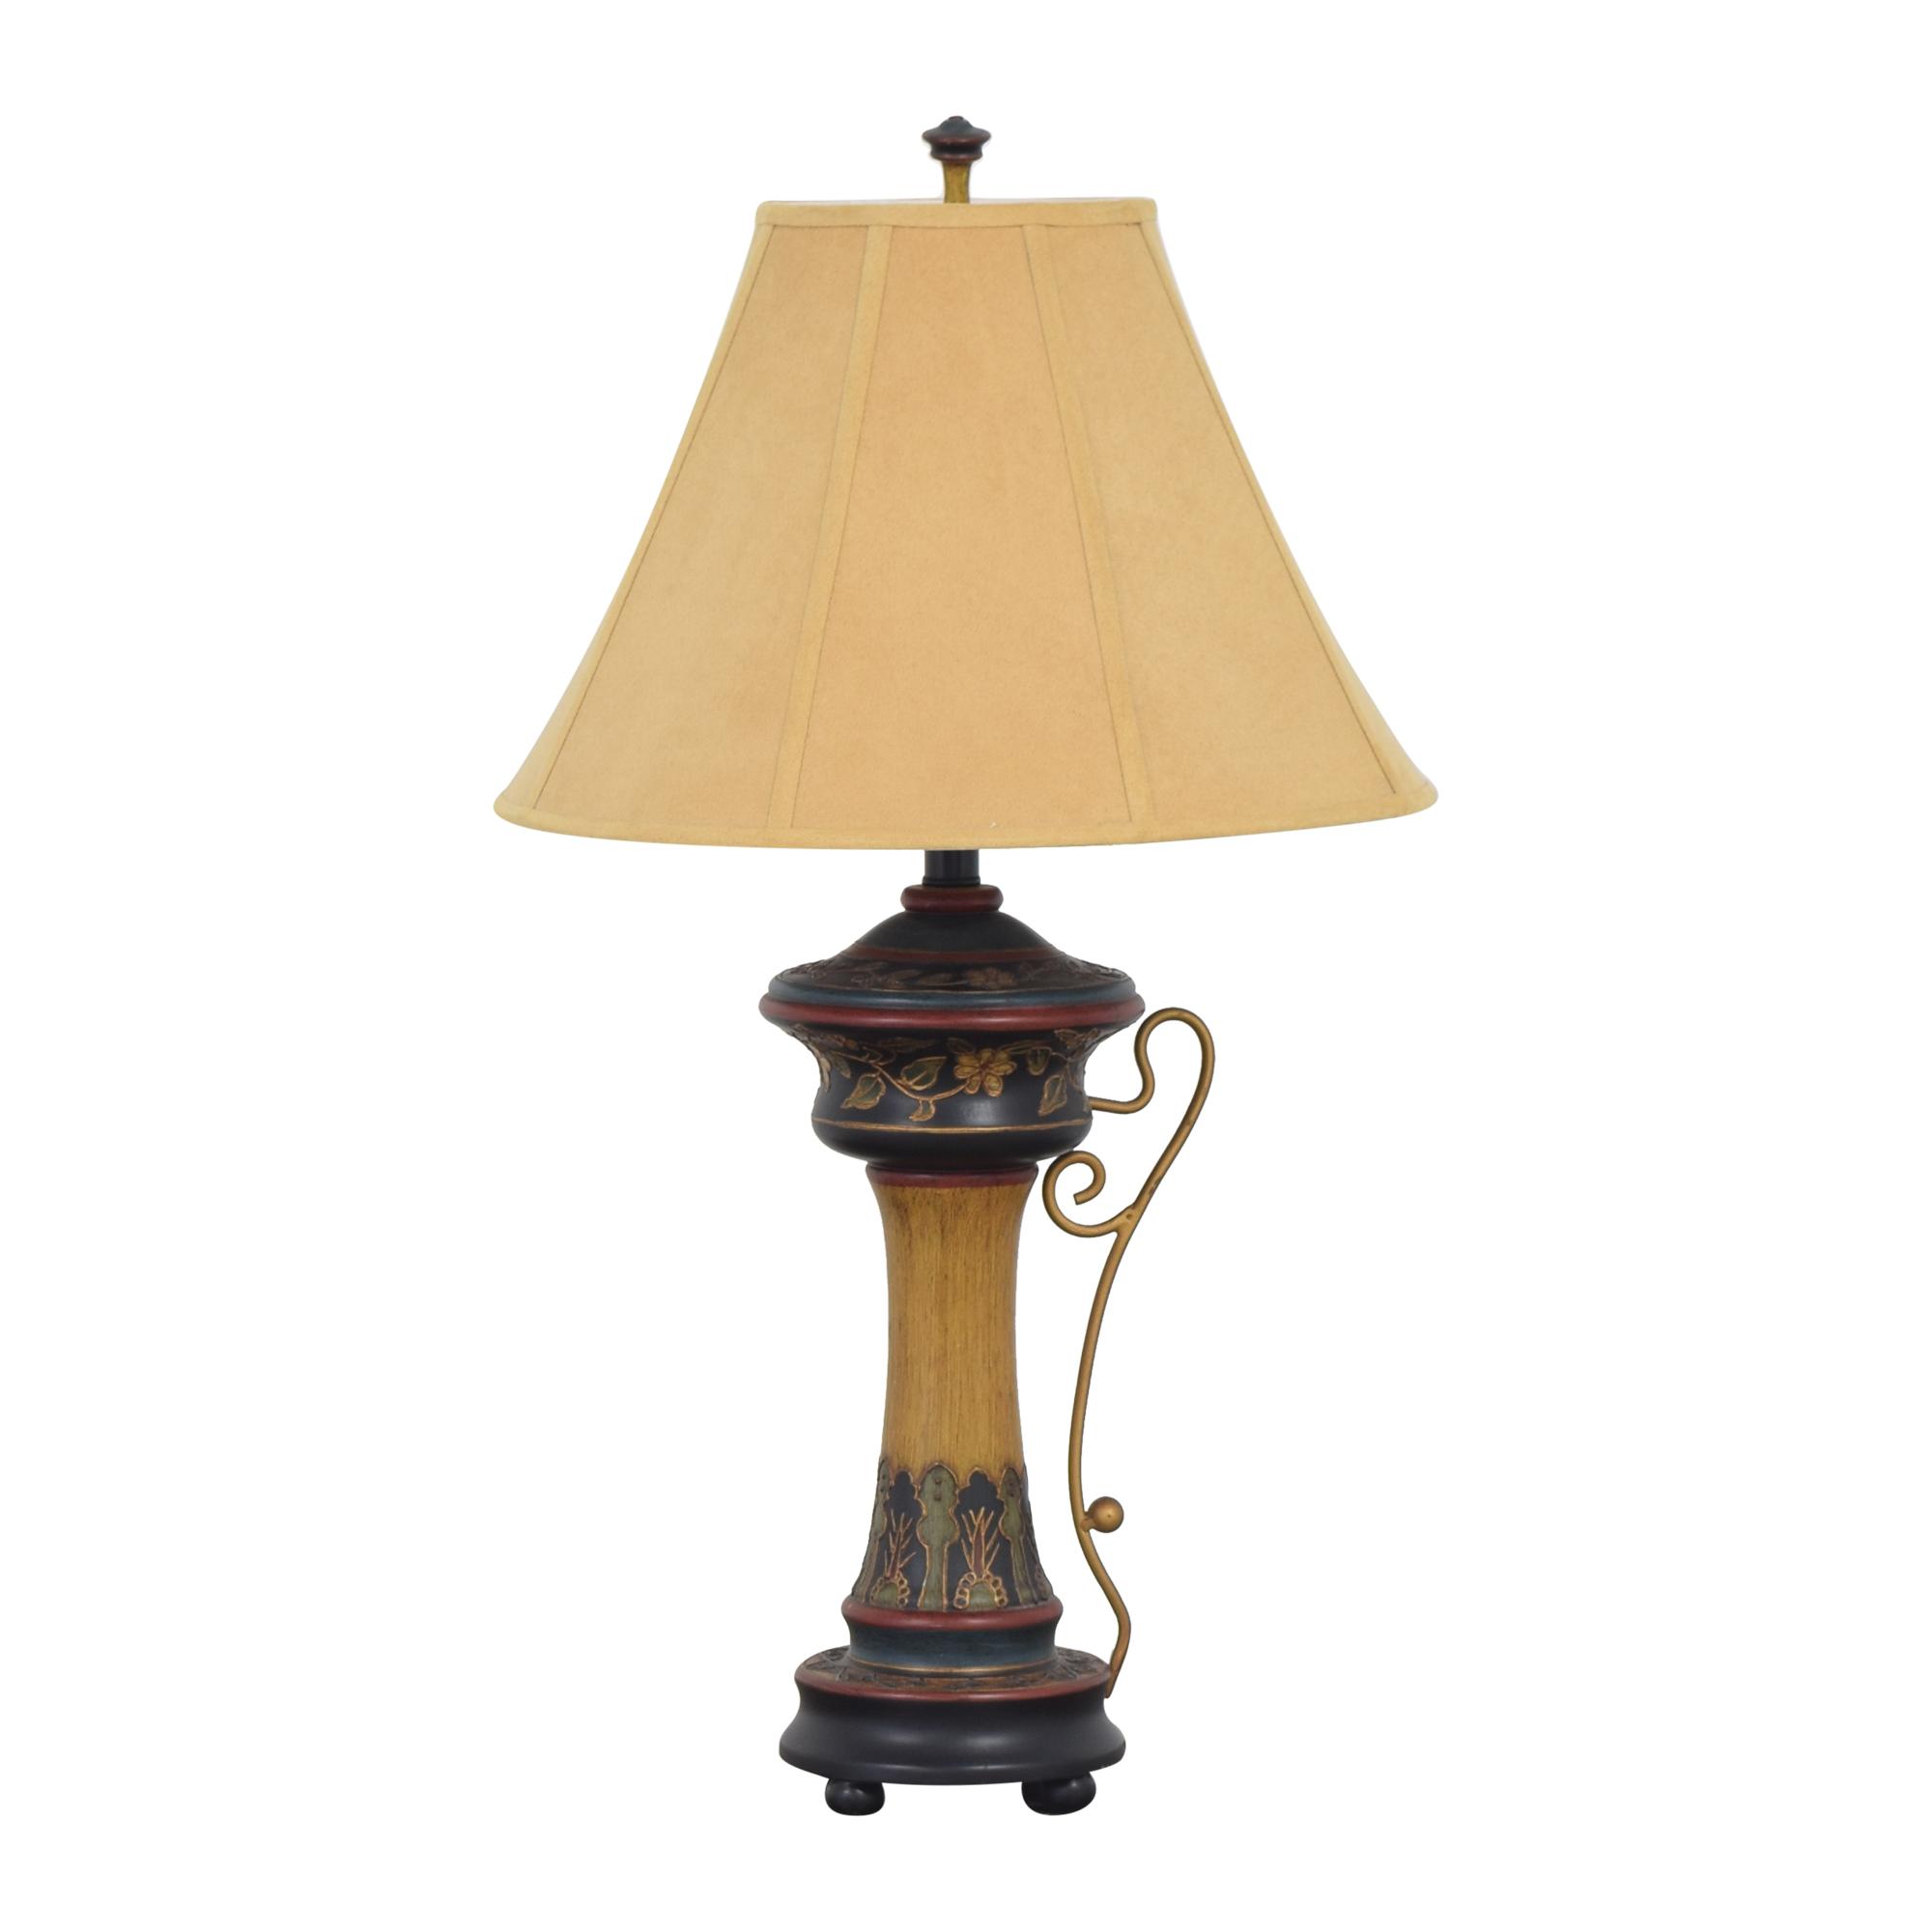 Vintage Table lamp Decor